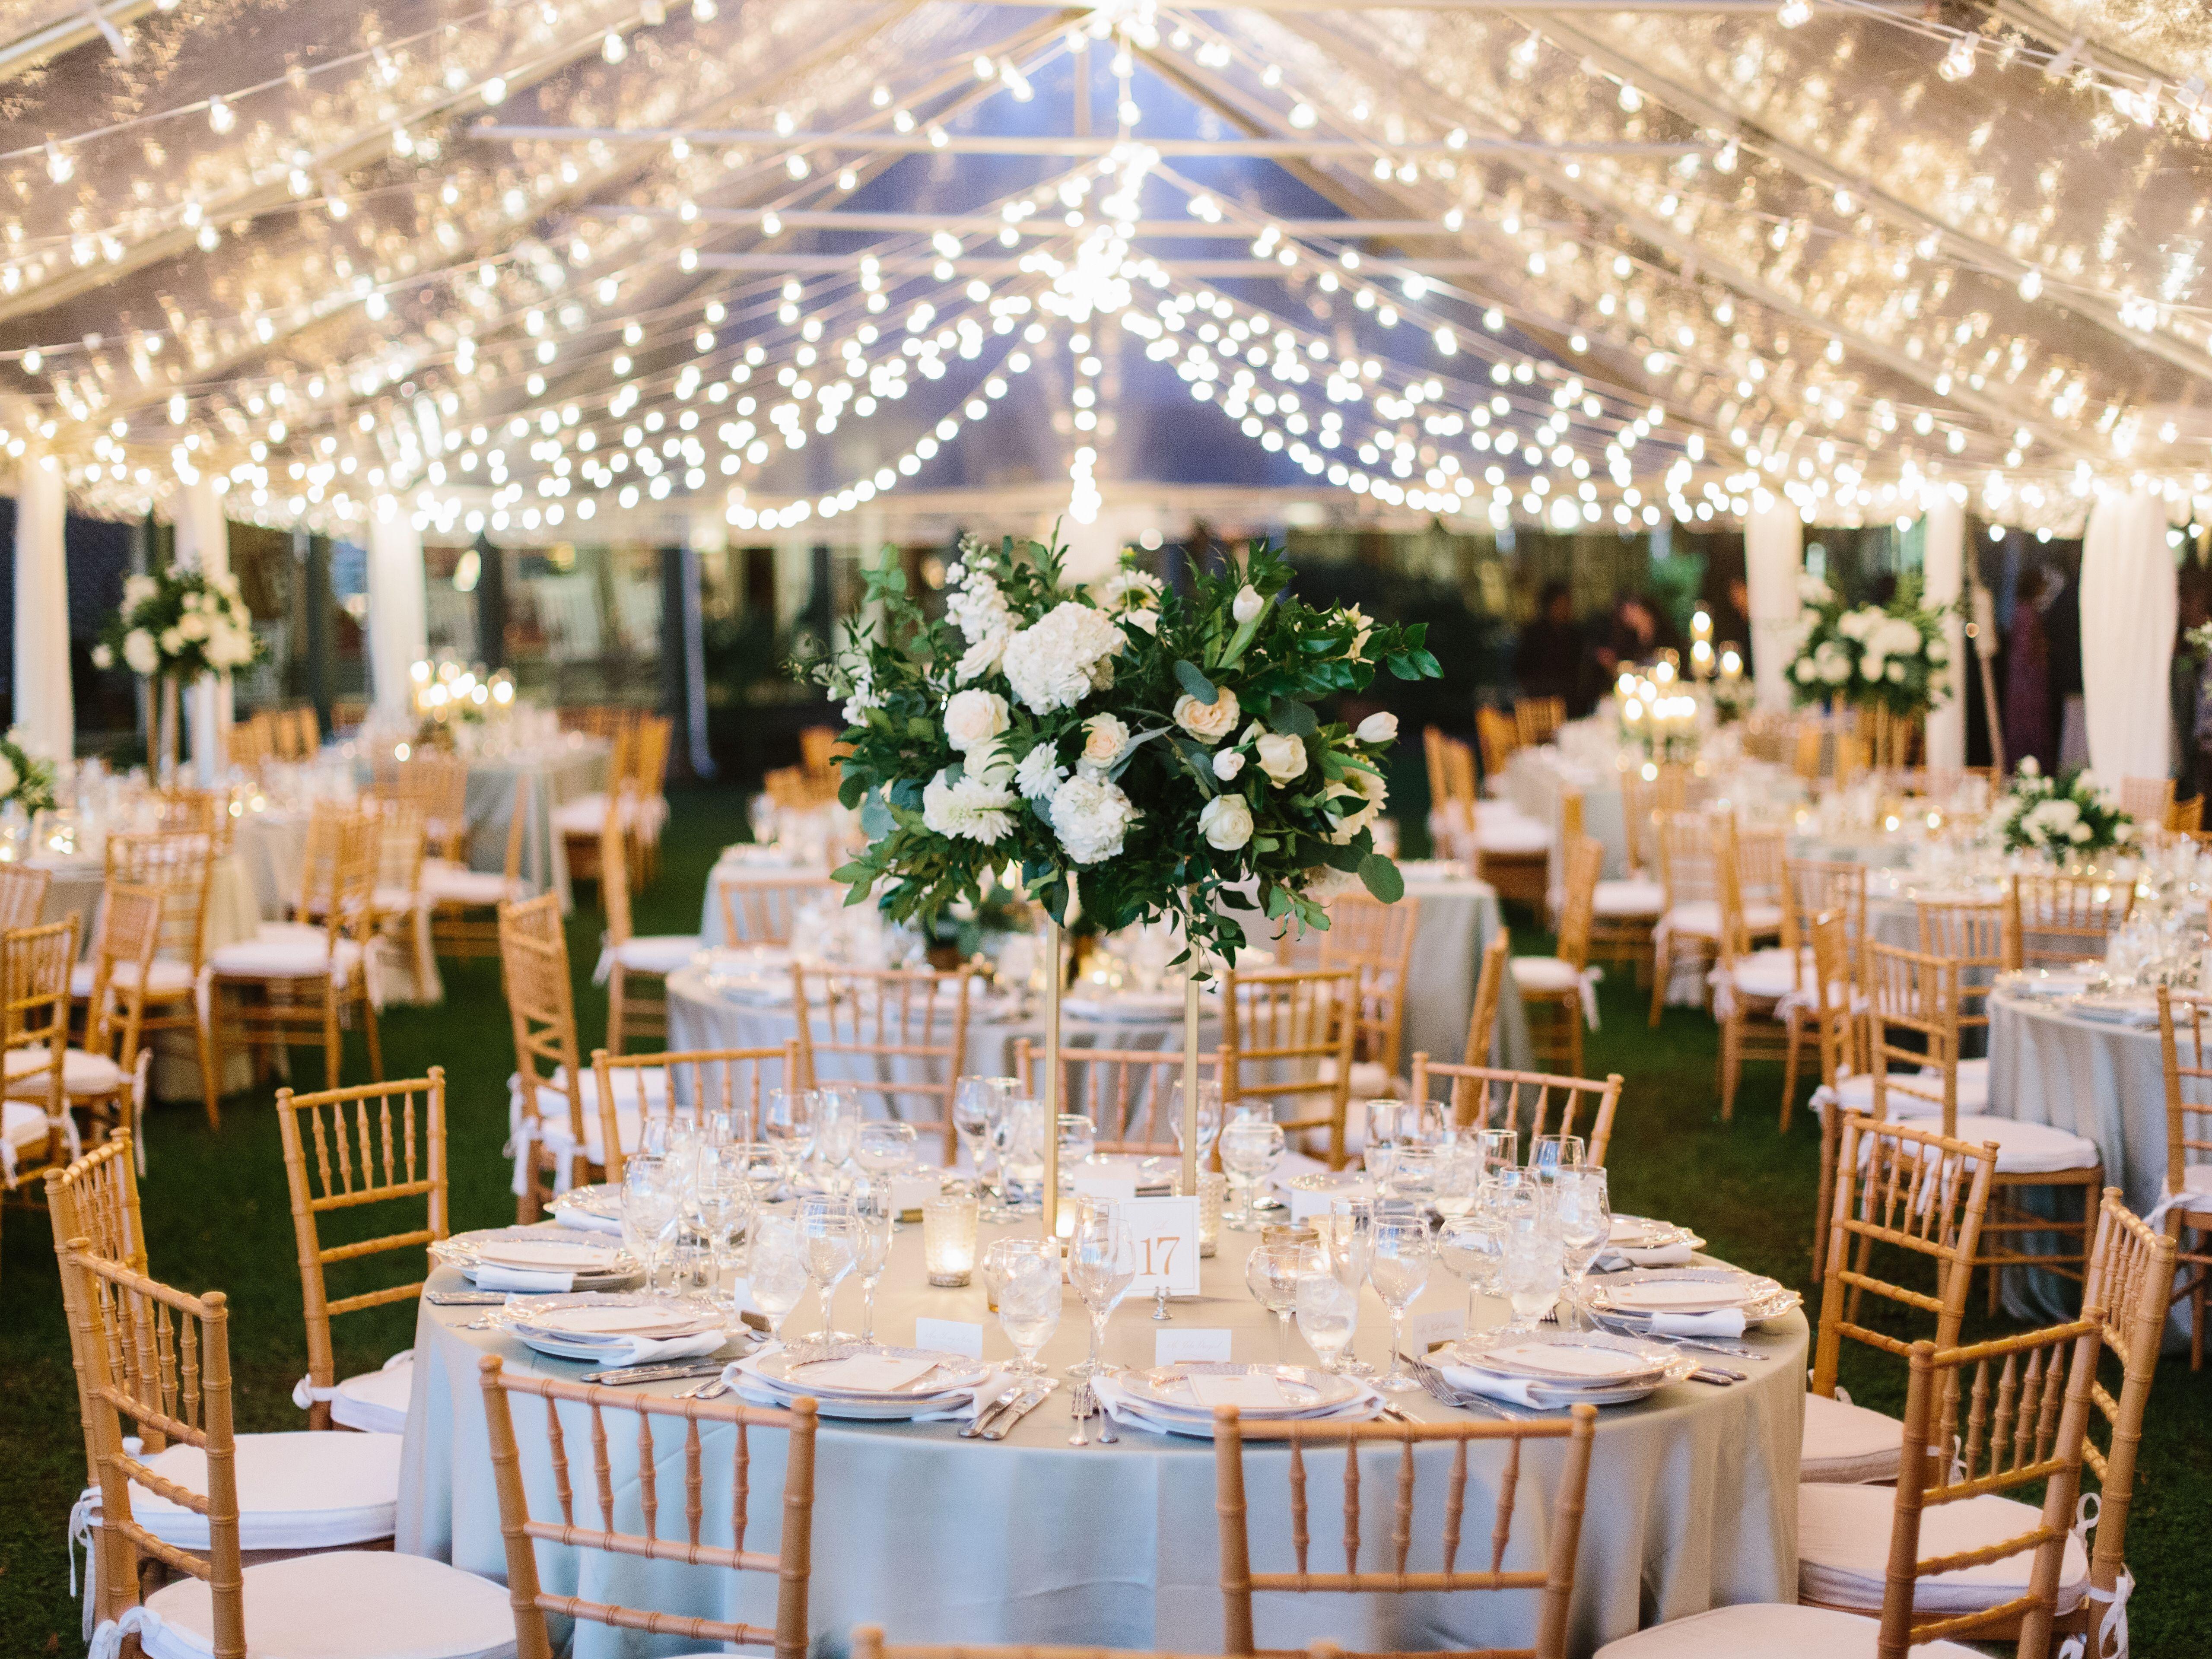 Rachel Red Photography Glam Wedding Decor Backyard Tent Wedding Tent Wedding Reception